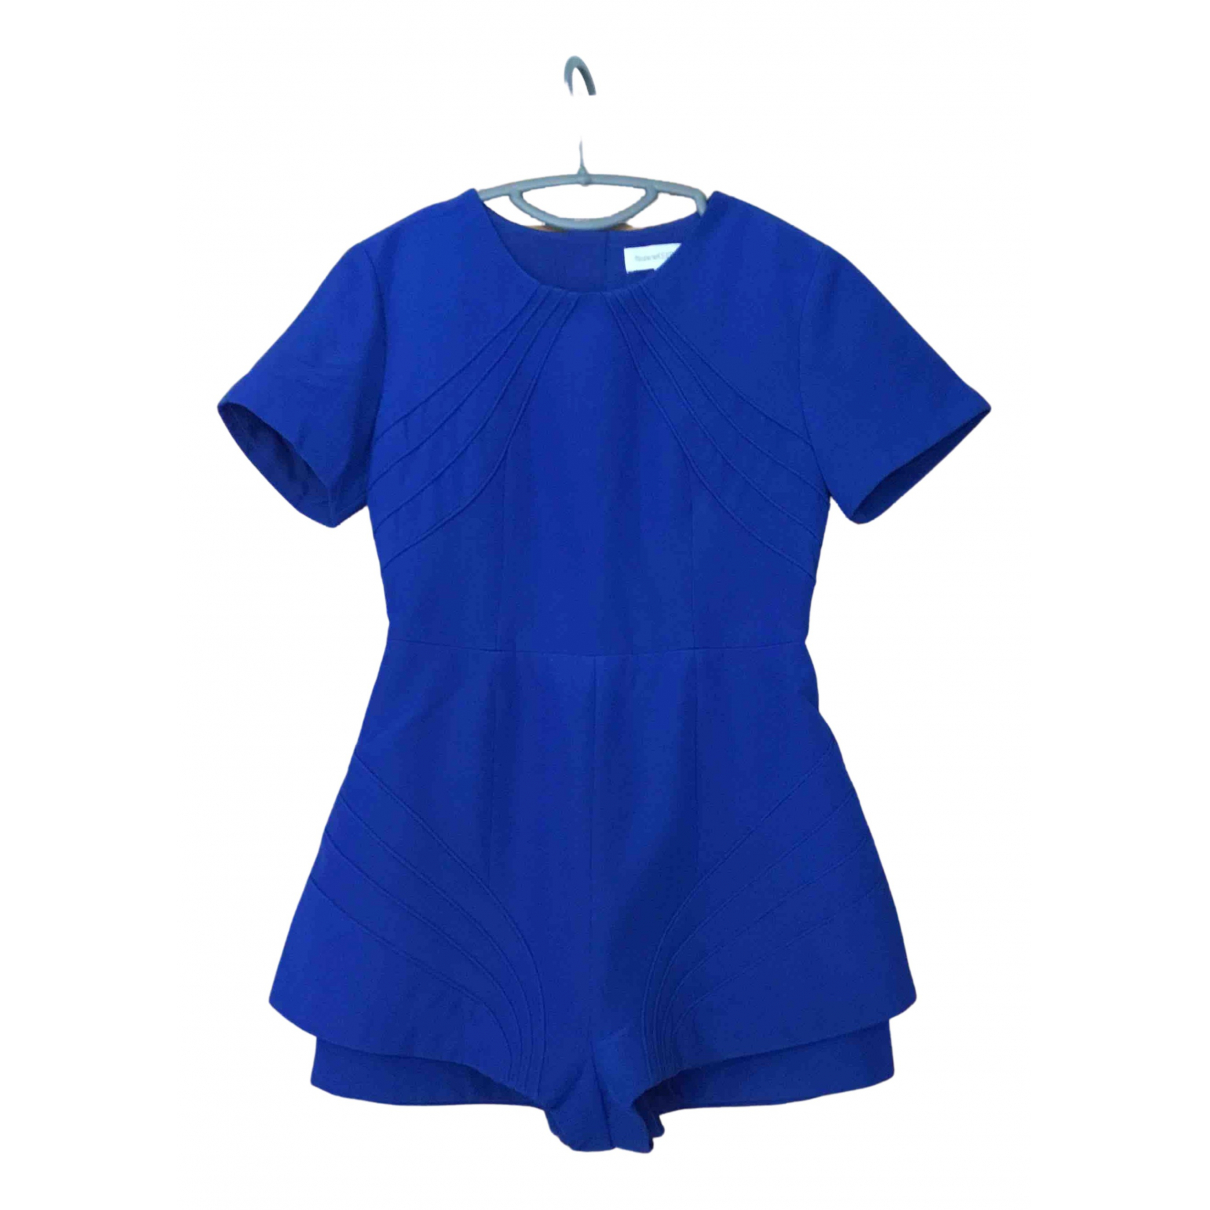 Finders Keepers - Combinaison   pour femme - bleu